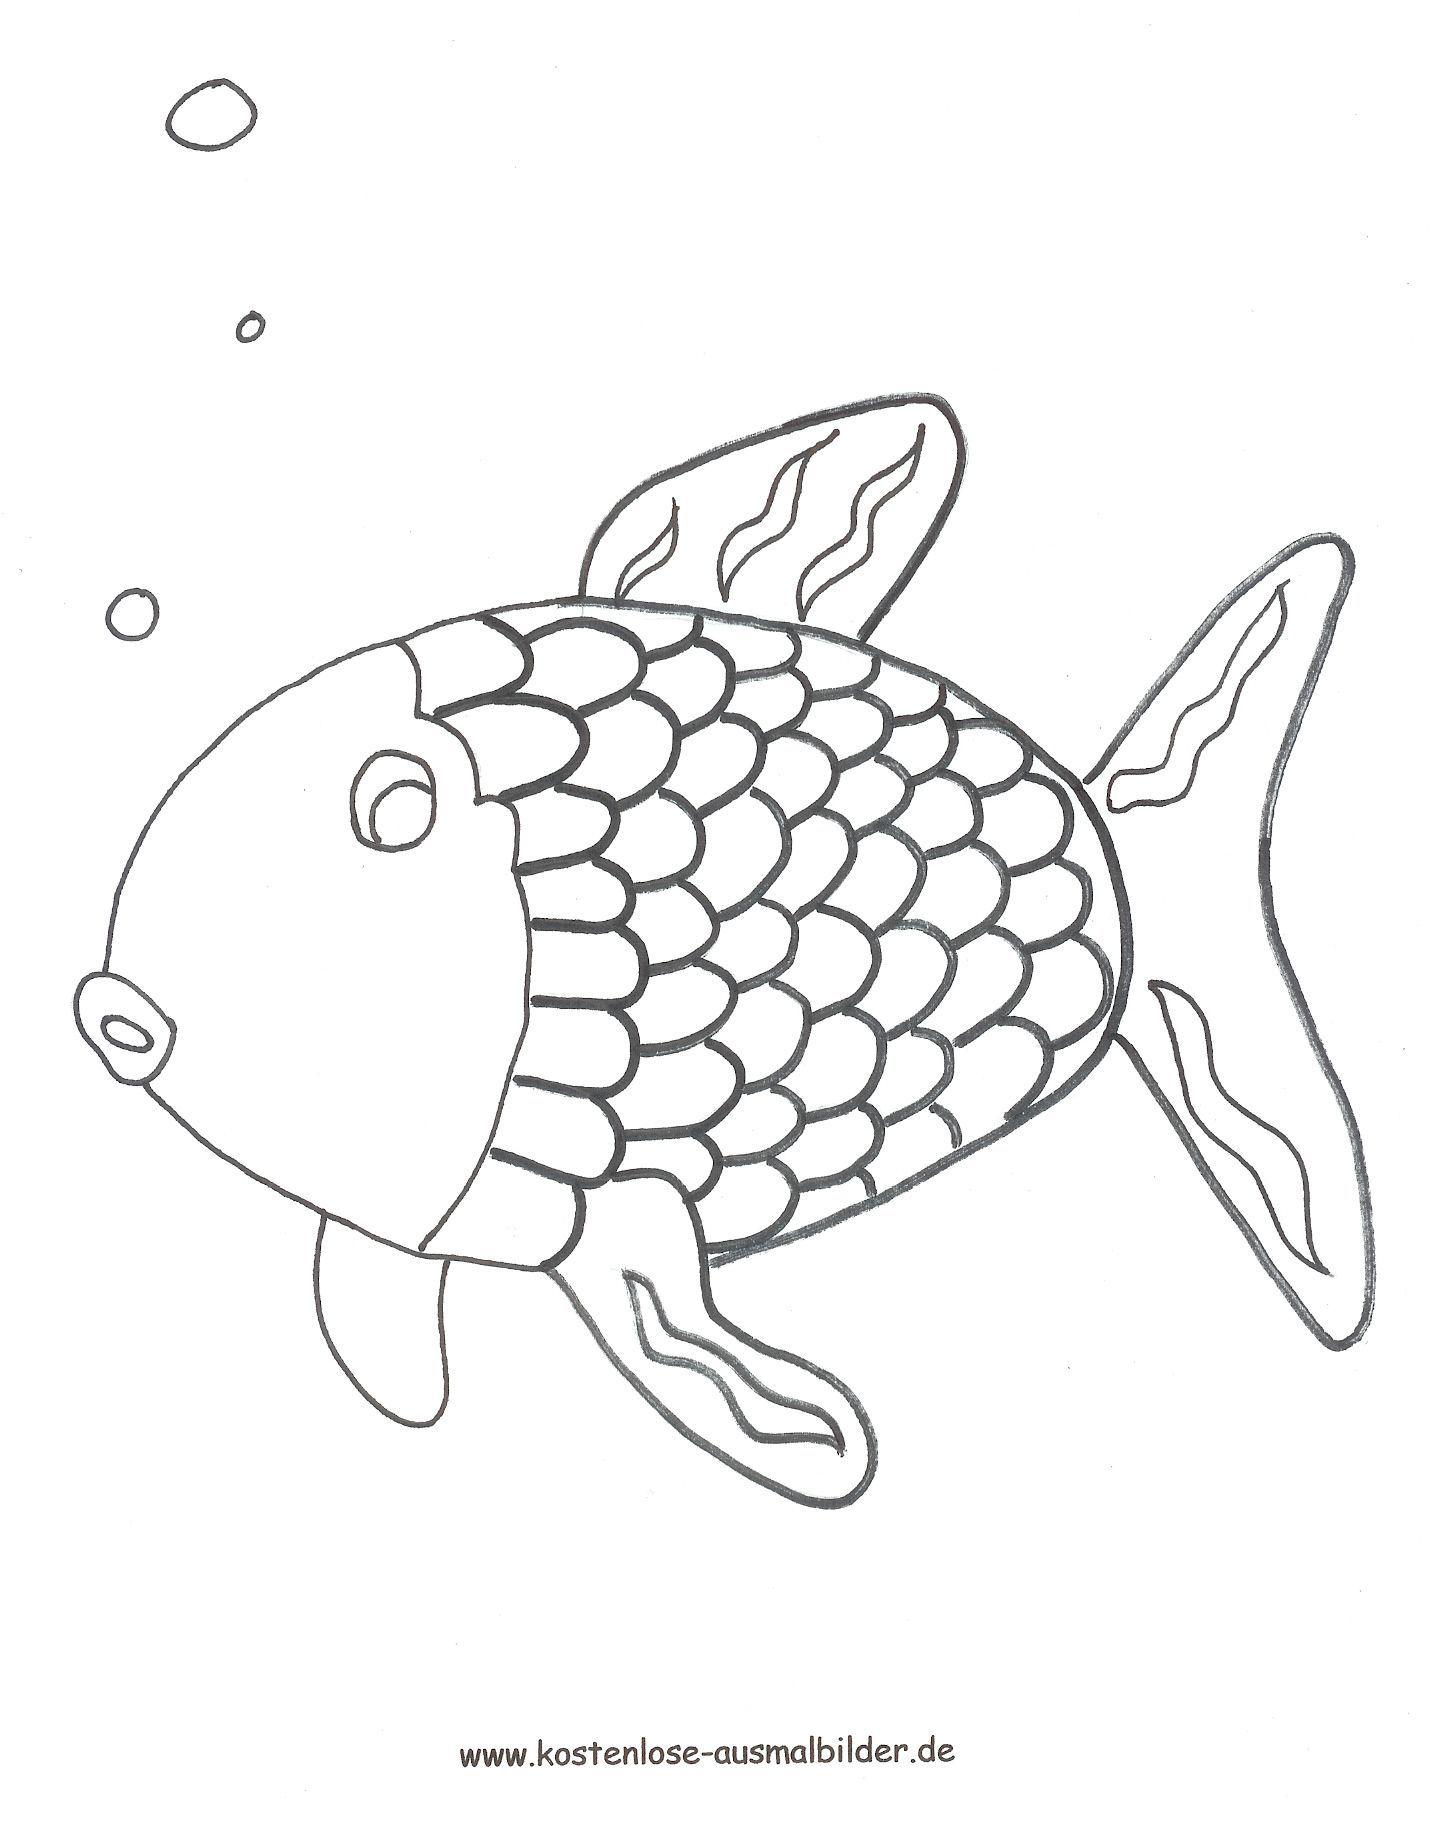 Rainbow fish coloring page - Rainbow fish coloring page